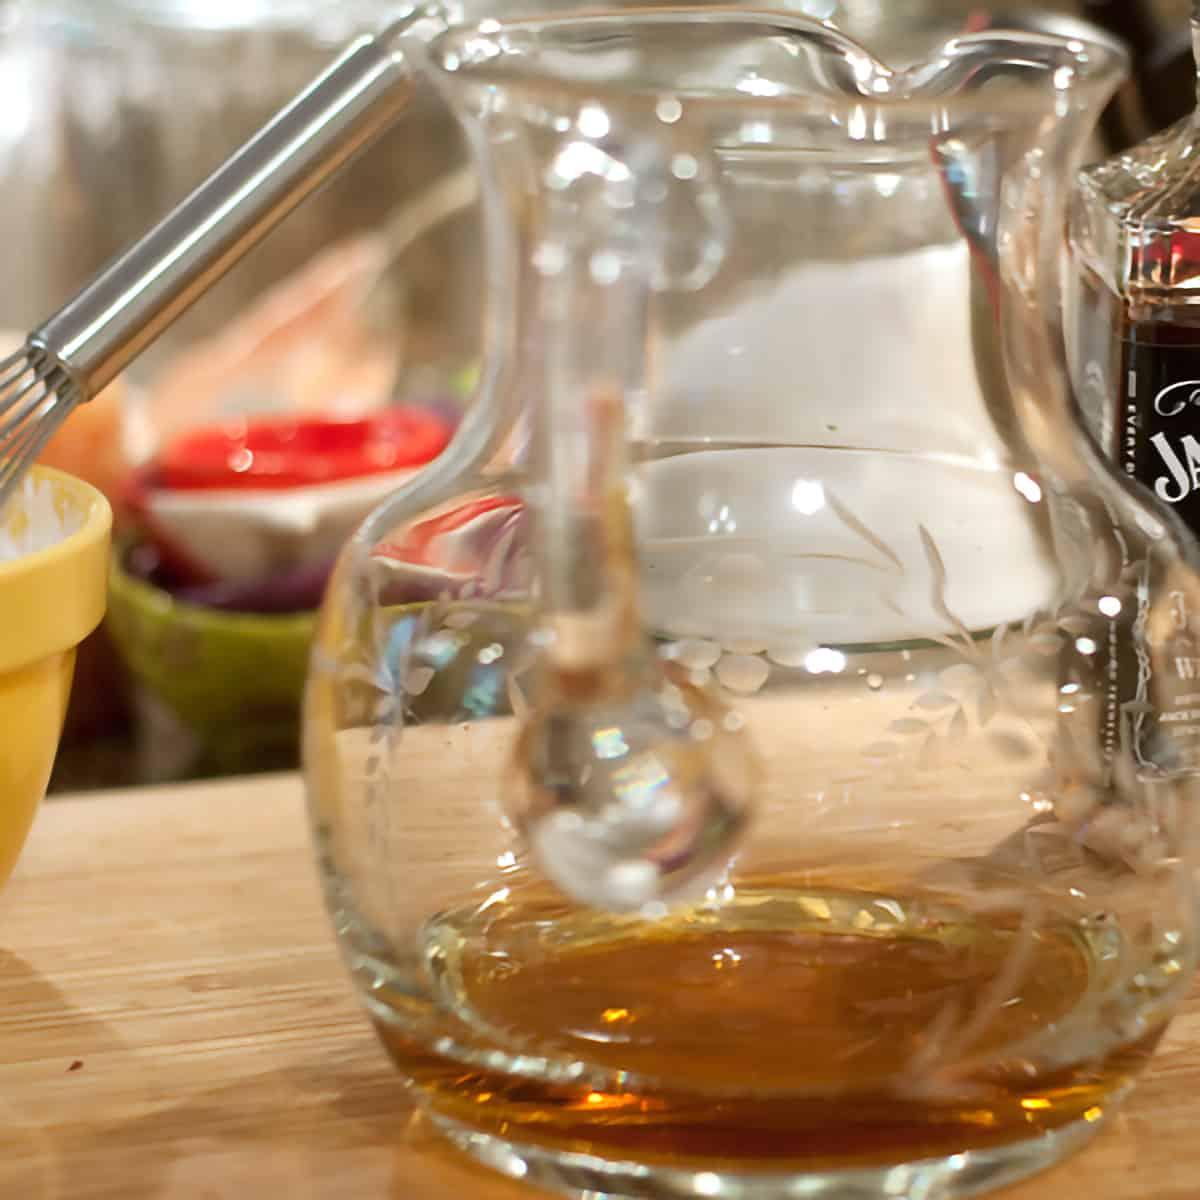 Glass pitcher containing bourbon.